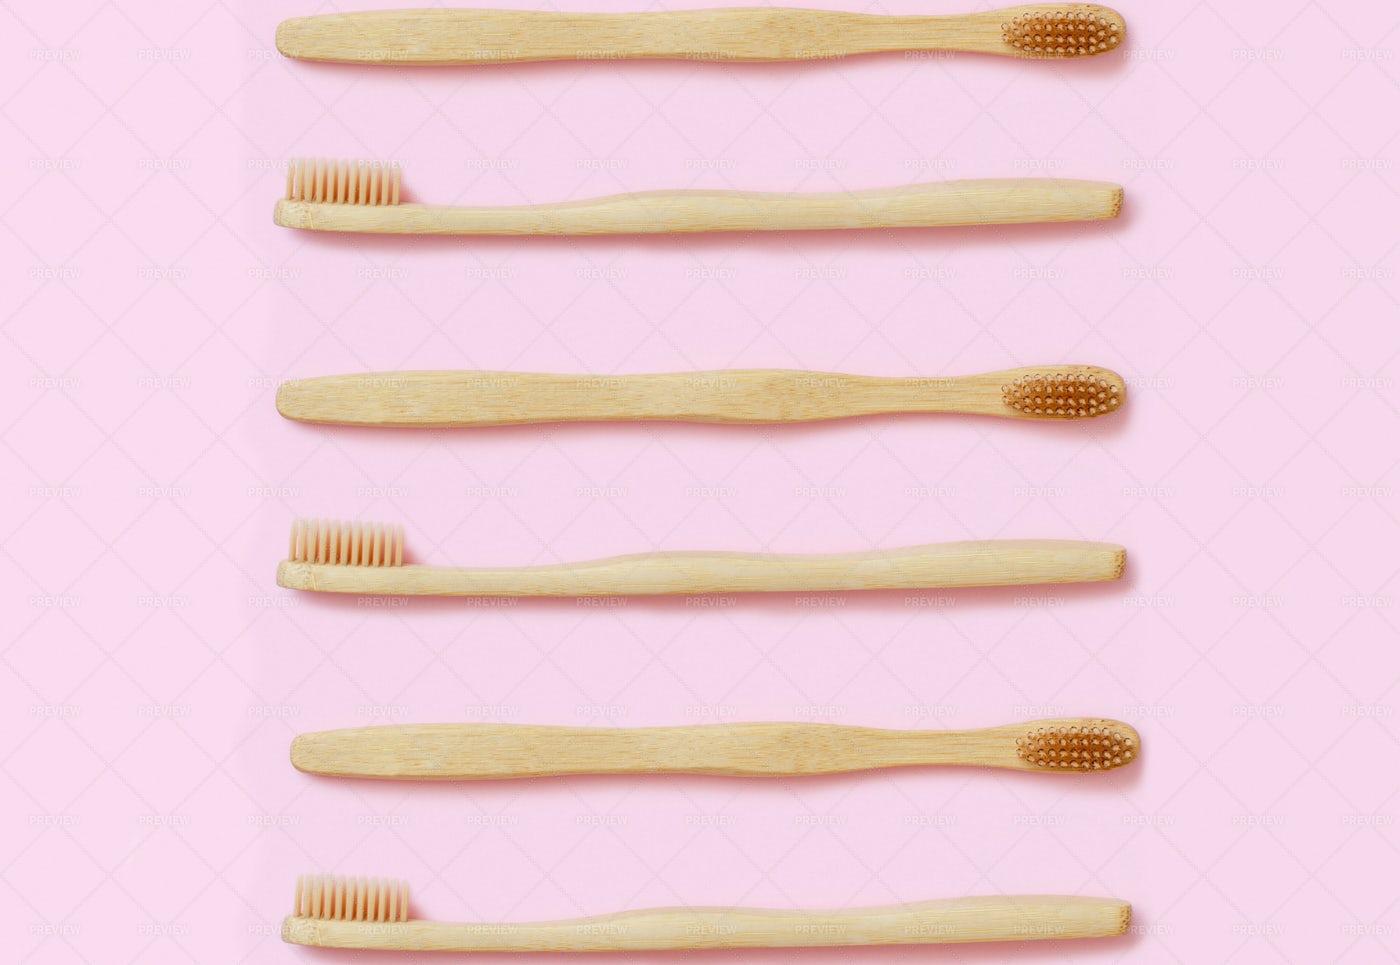 Bamboo Toothbrushes: Stock Photos